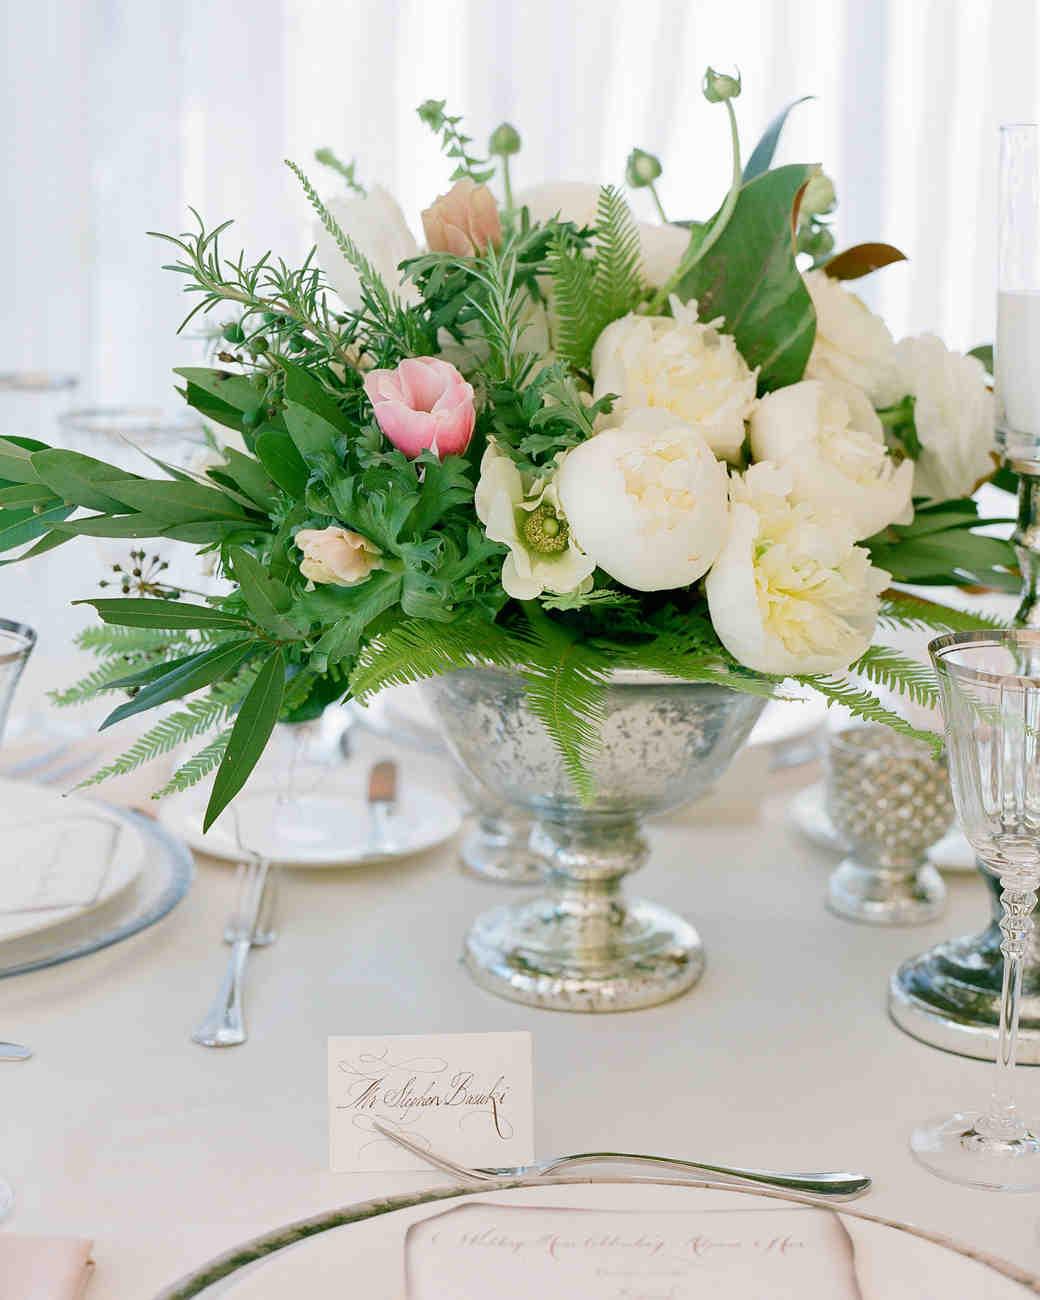 adriana-han-wedding-58080012-s111814.jpg